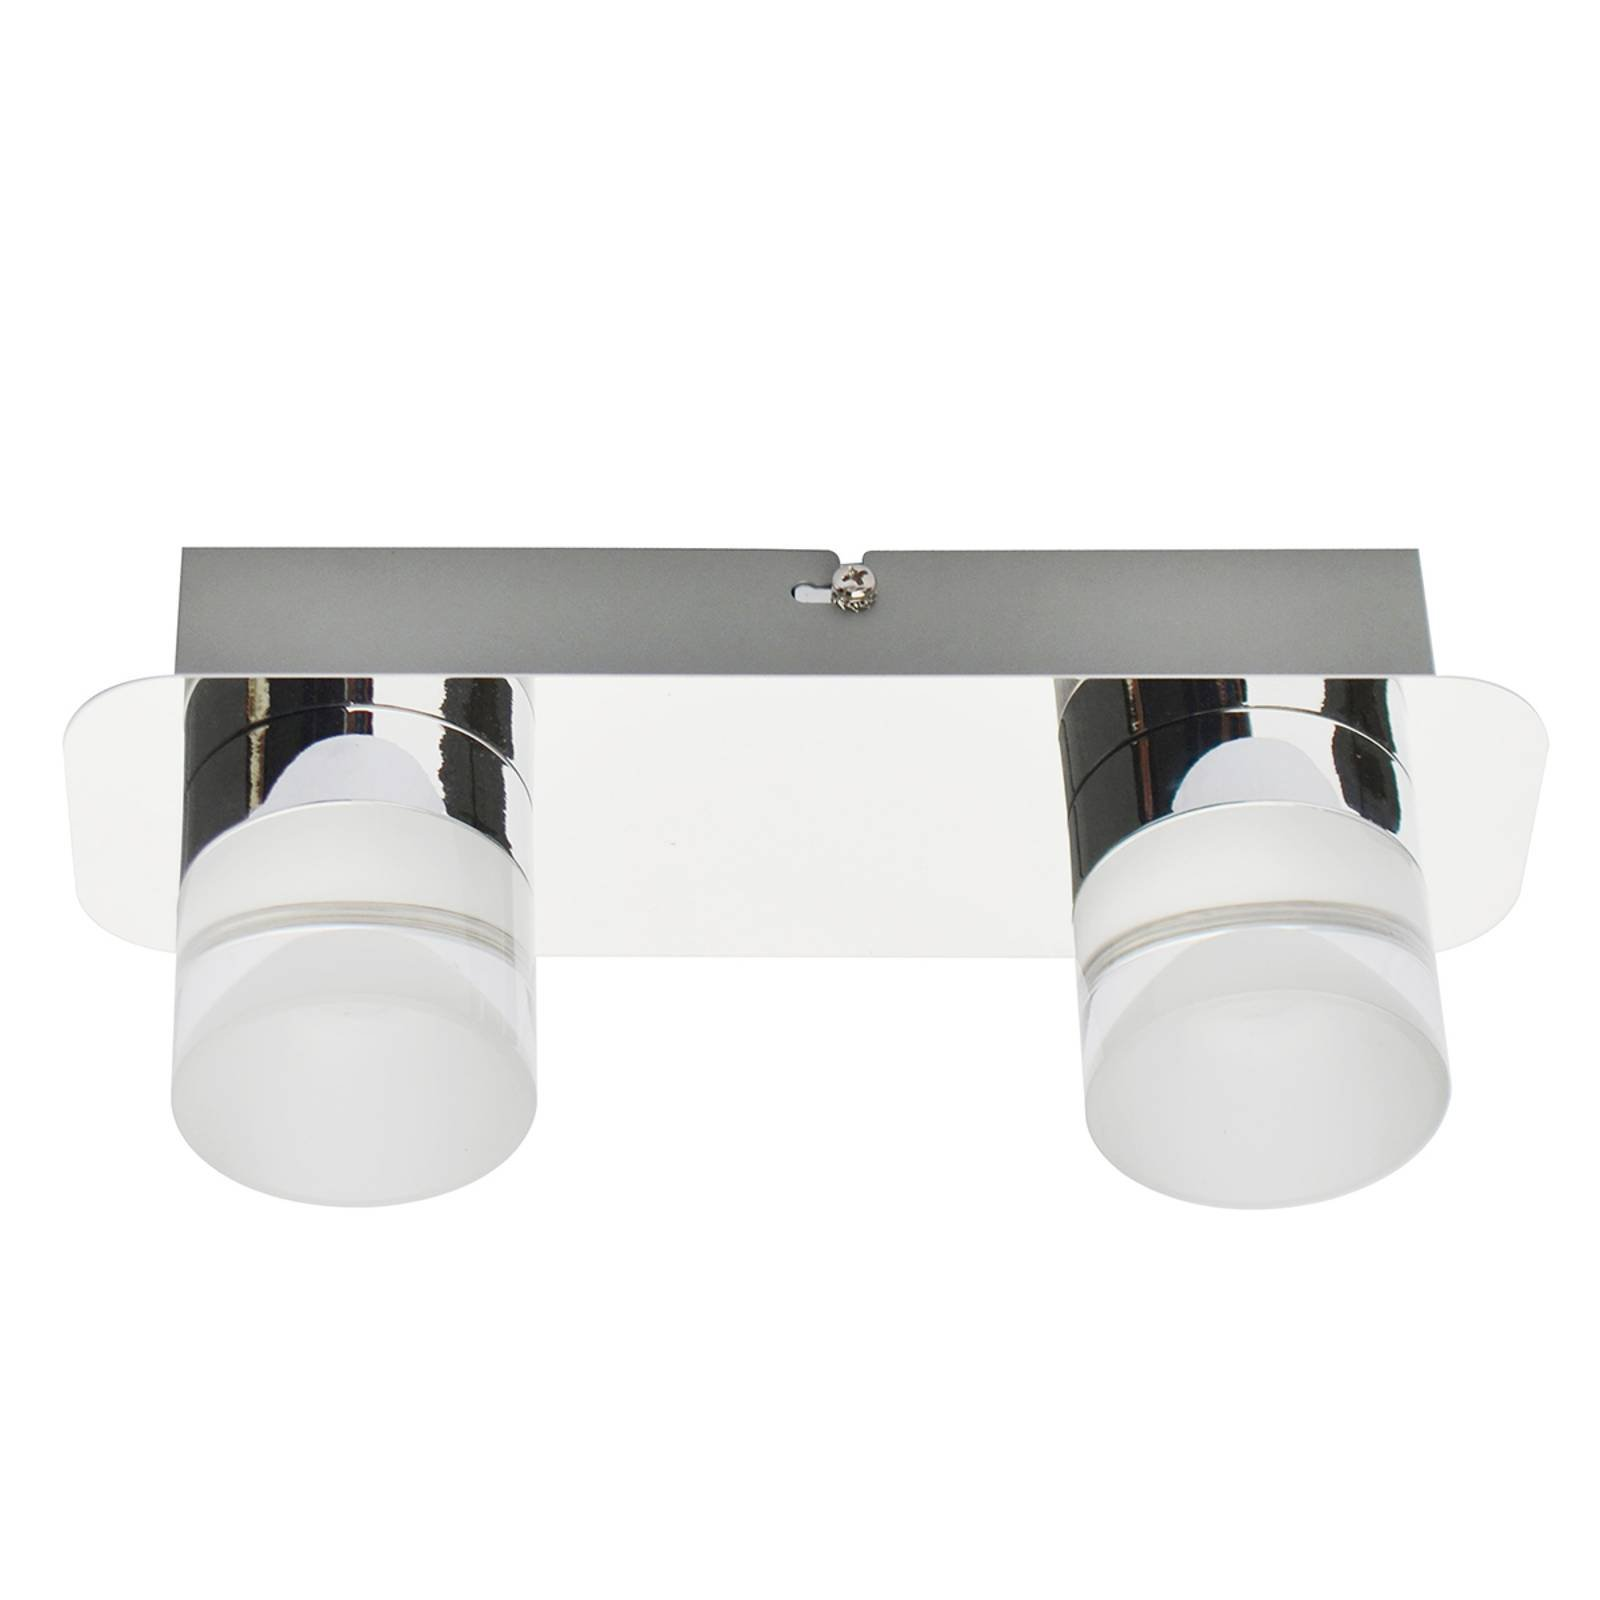 Stefanie - 2-lys Taklampe i moderne design